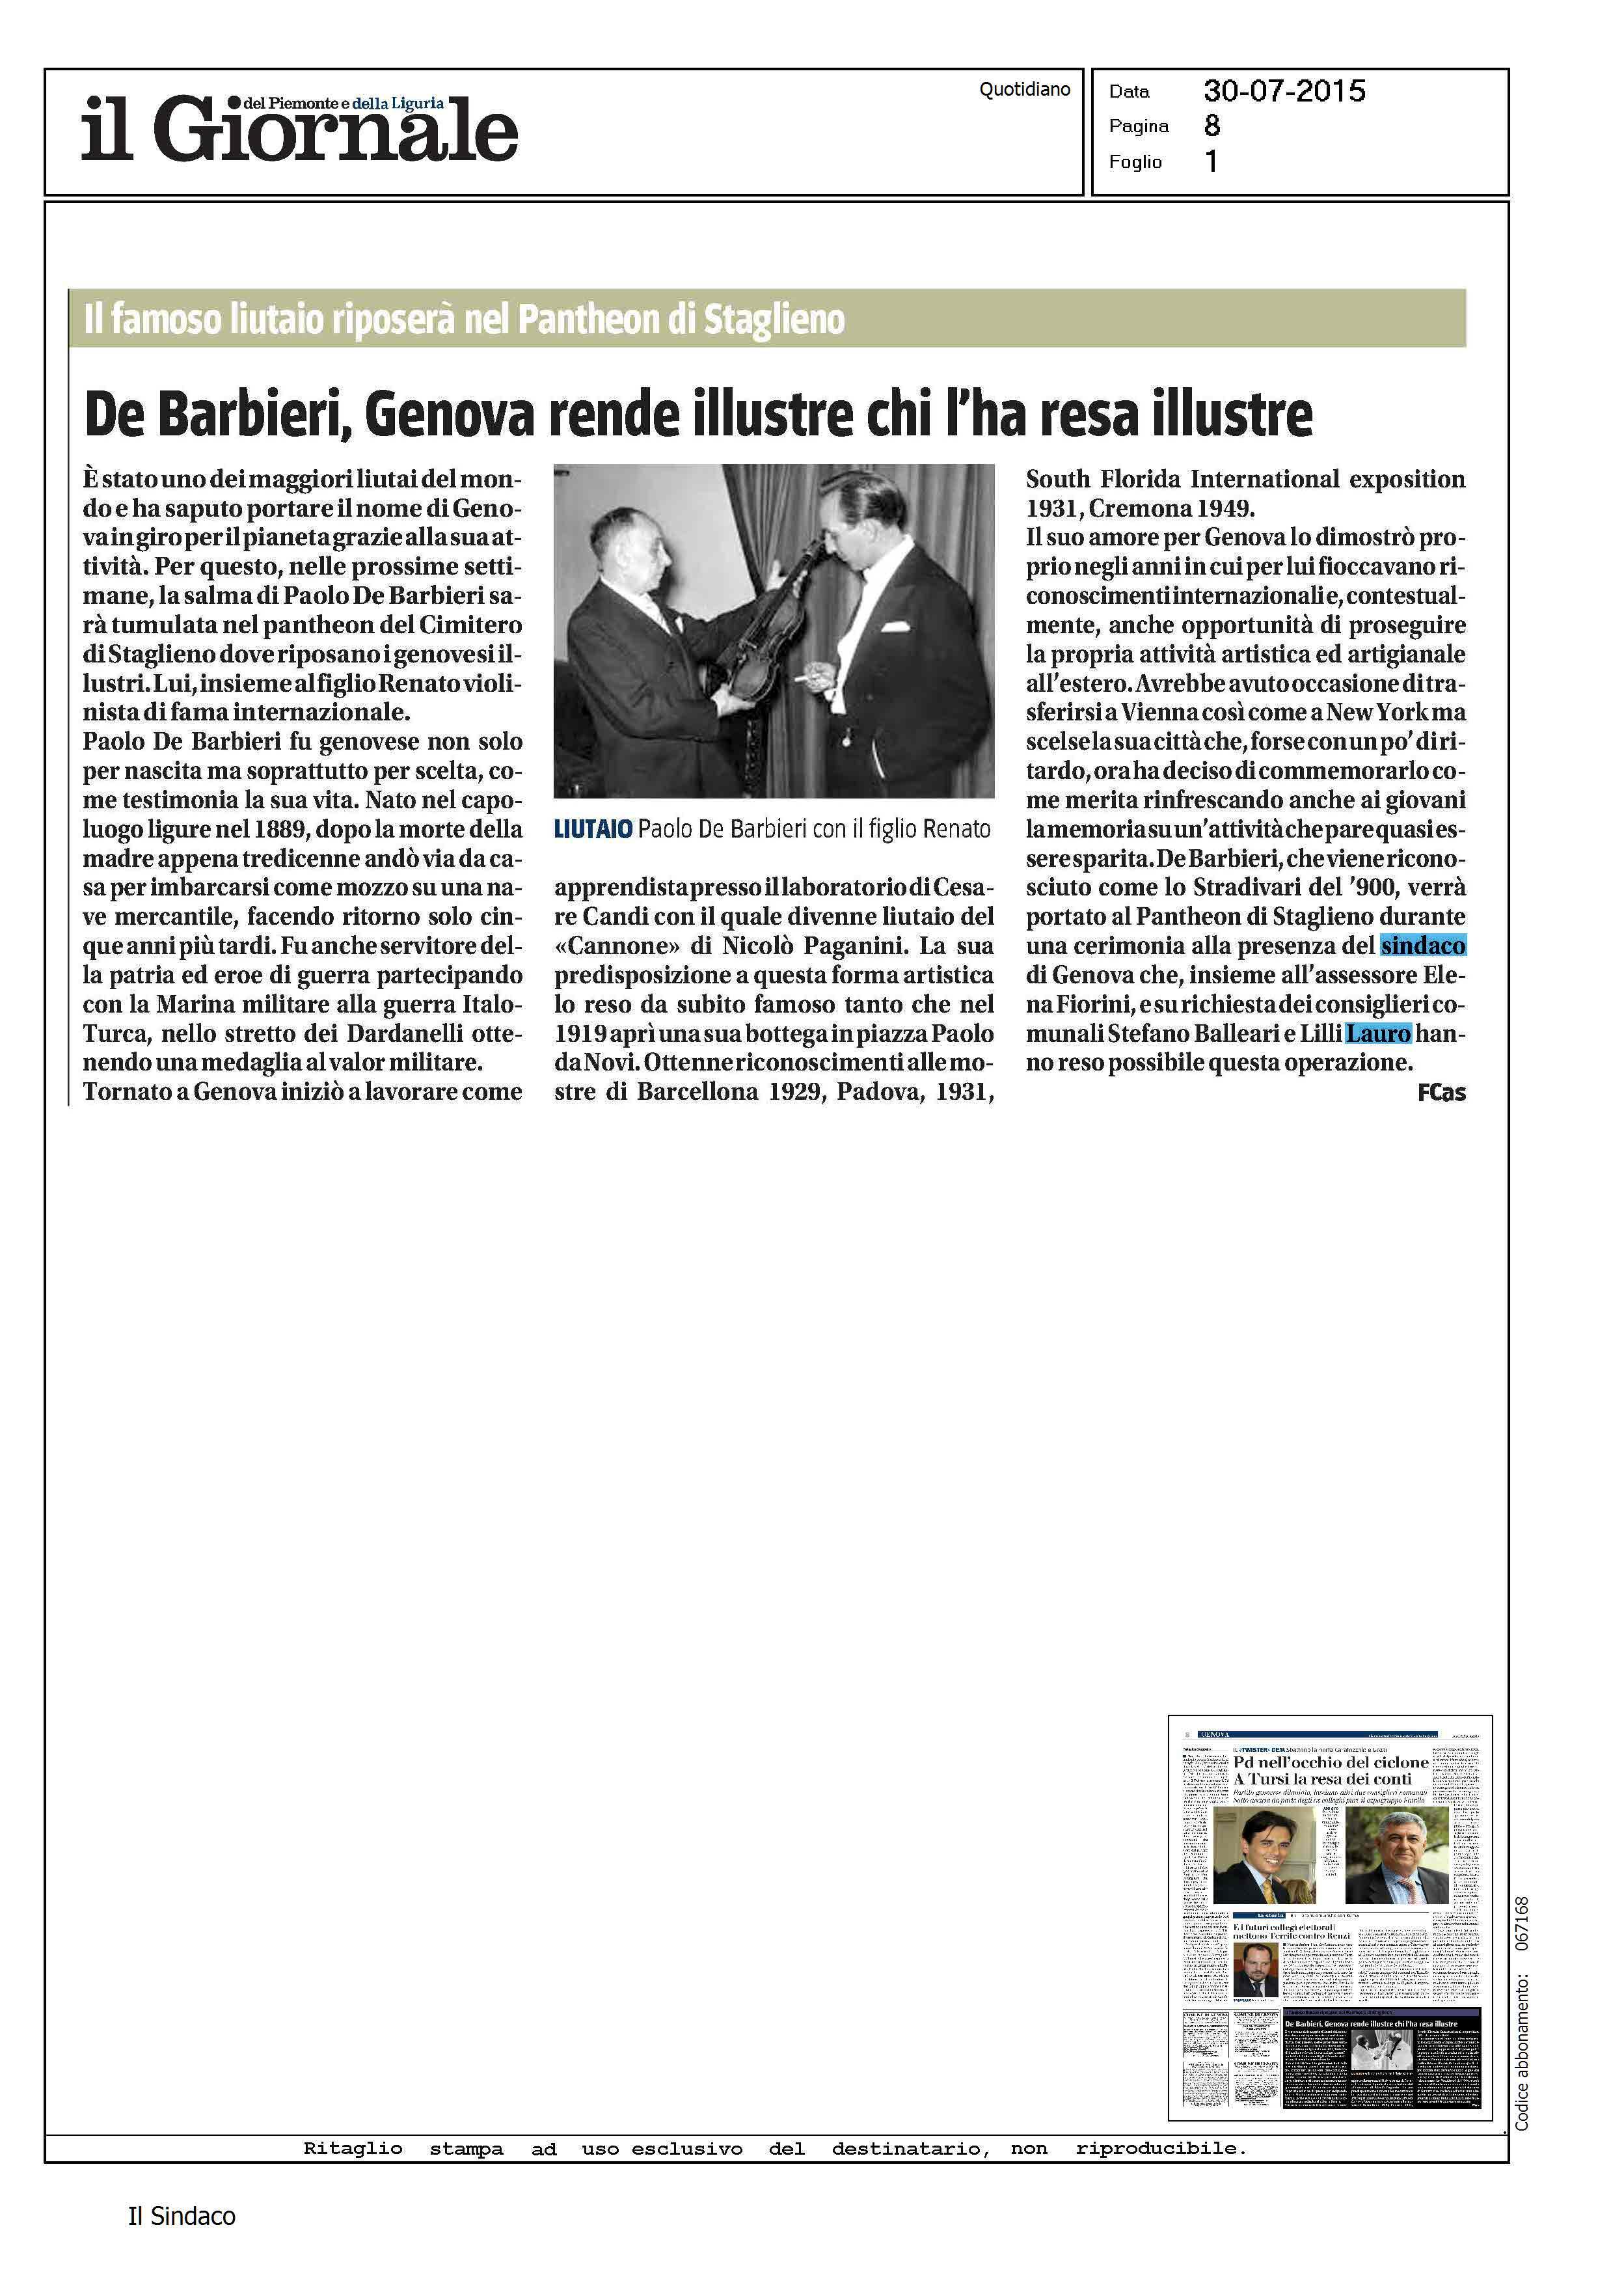 30 07 2015 Rassegna stampa – De Barbieri Genova rende illustre chi l ha resa illustre